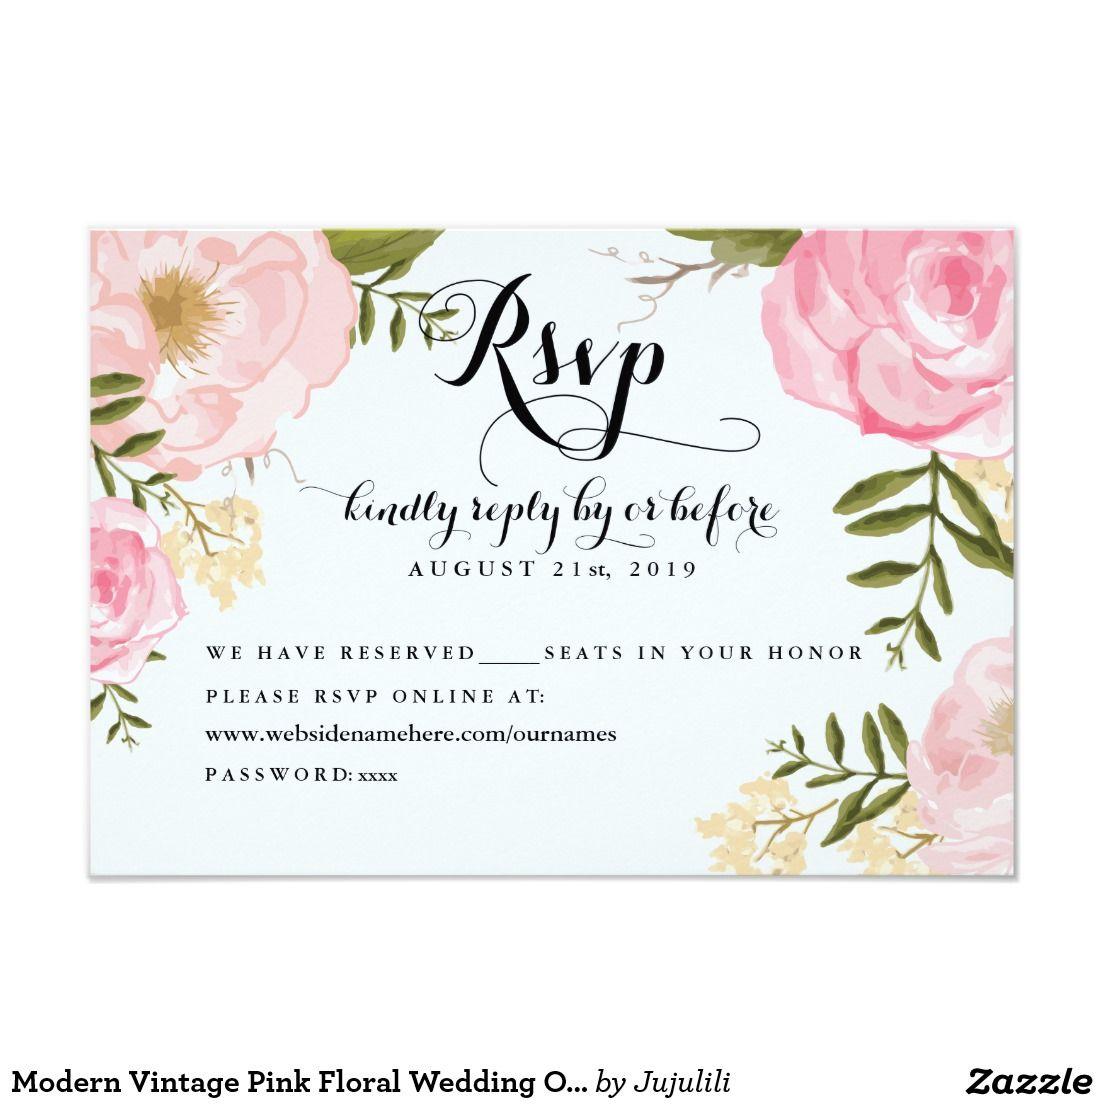 weddings invitations online online wedding invitations How To Word Wedding Invitations With Online Rsvp How Free How To Word Wedding Invitations